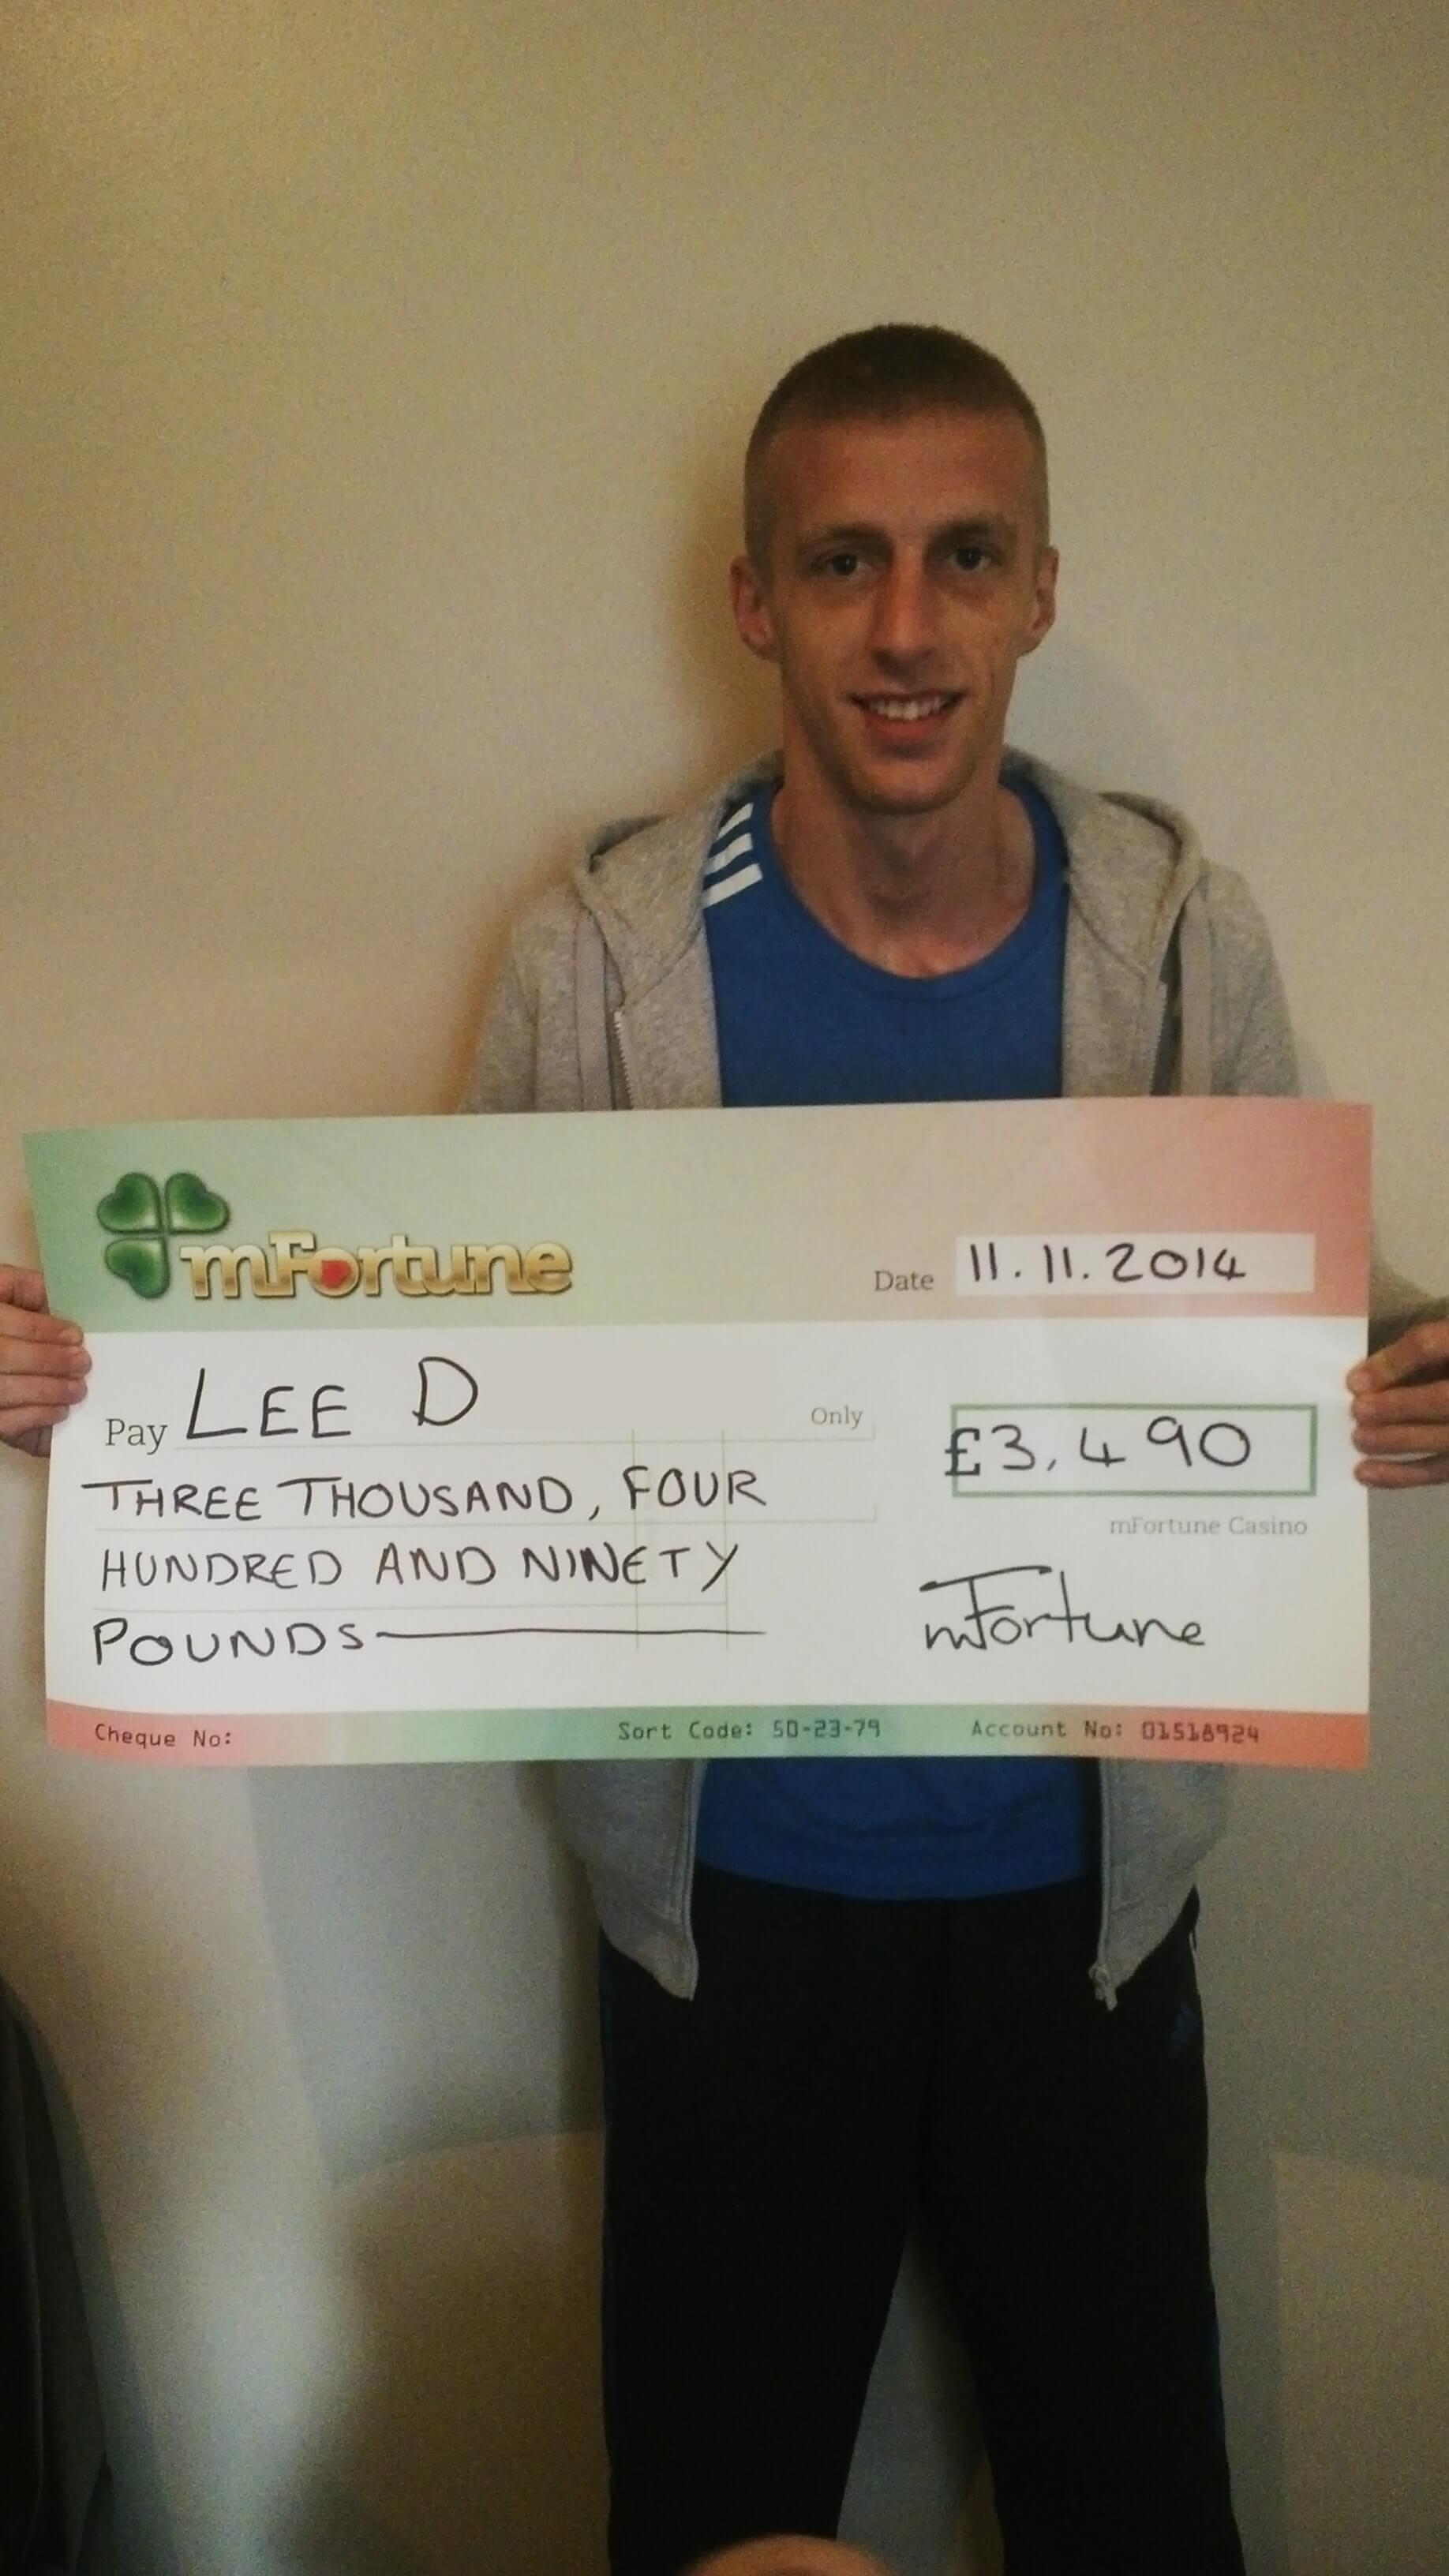 Lee D won £ 3,490